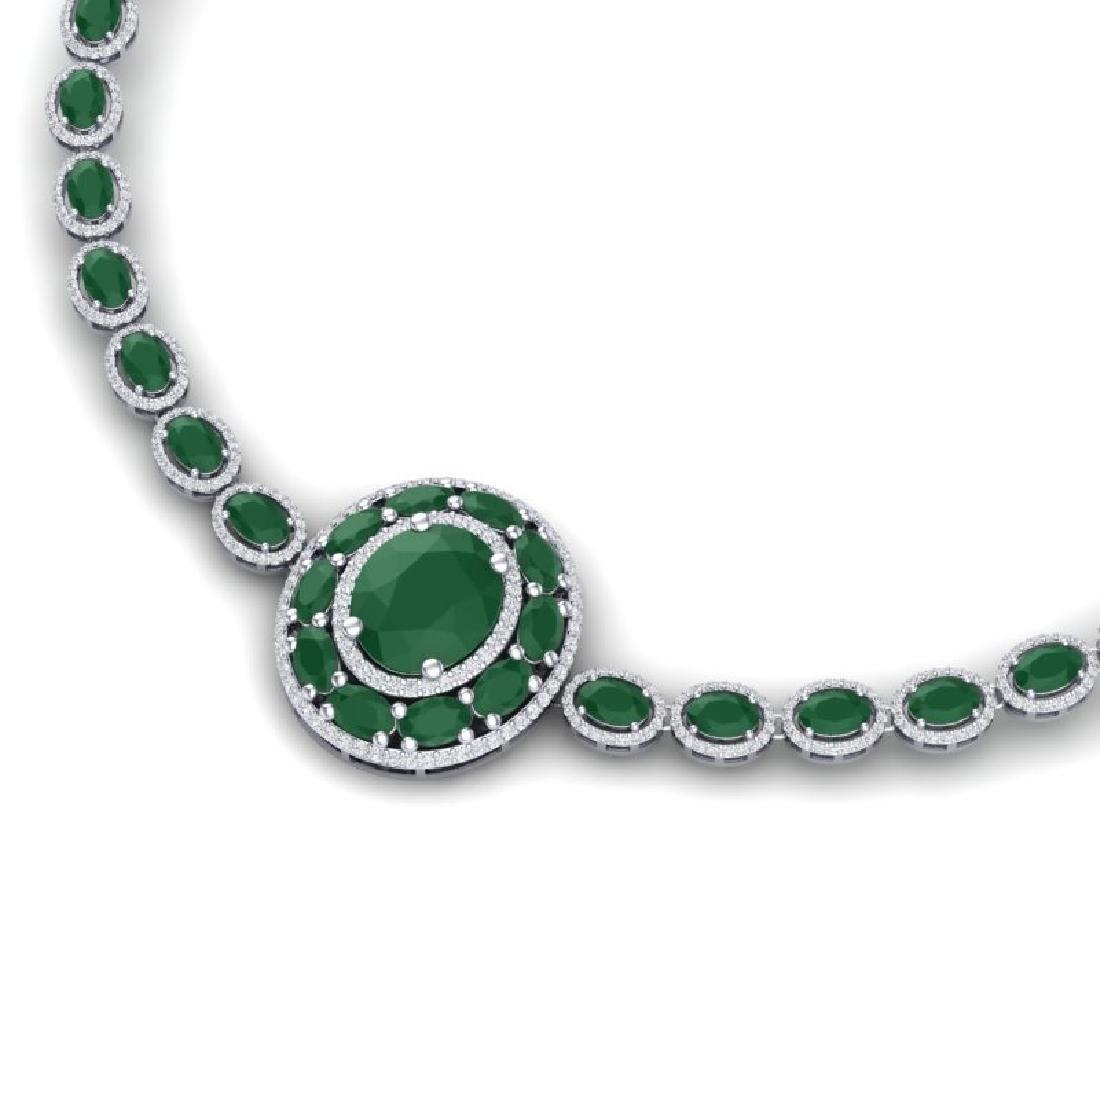 43.54 CTW Royalty Emerald & VS Diamond Necklace 18K